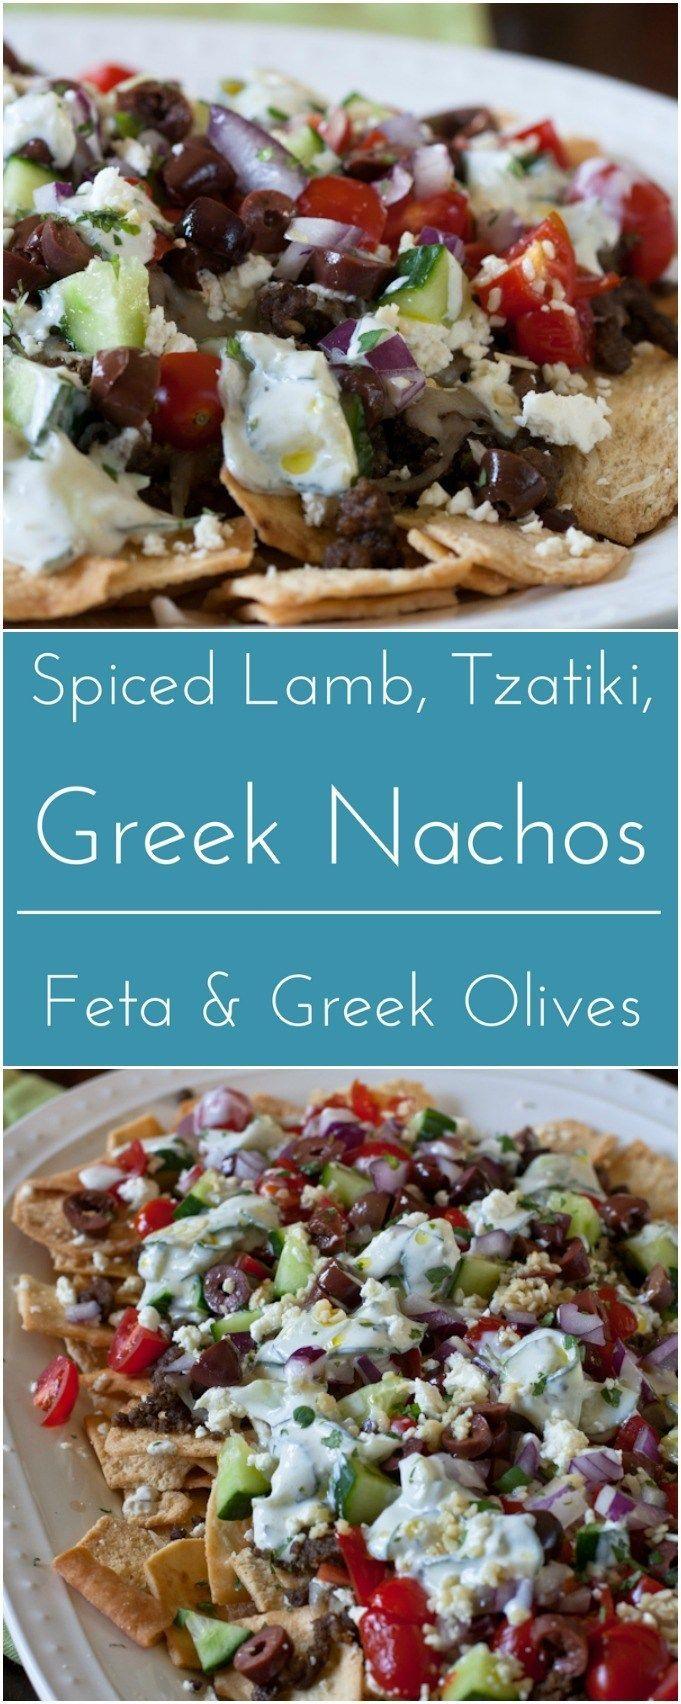 Loaded Greek nachos with Spiced Lamb, tzatziki, feta and Greek olives. (summer food foodies)